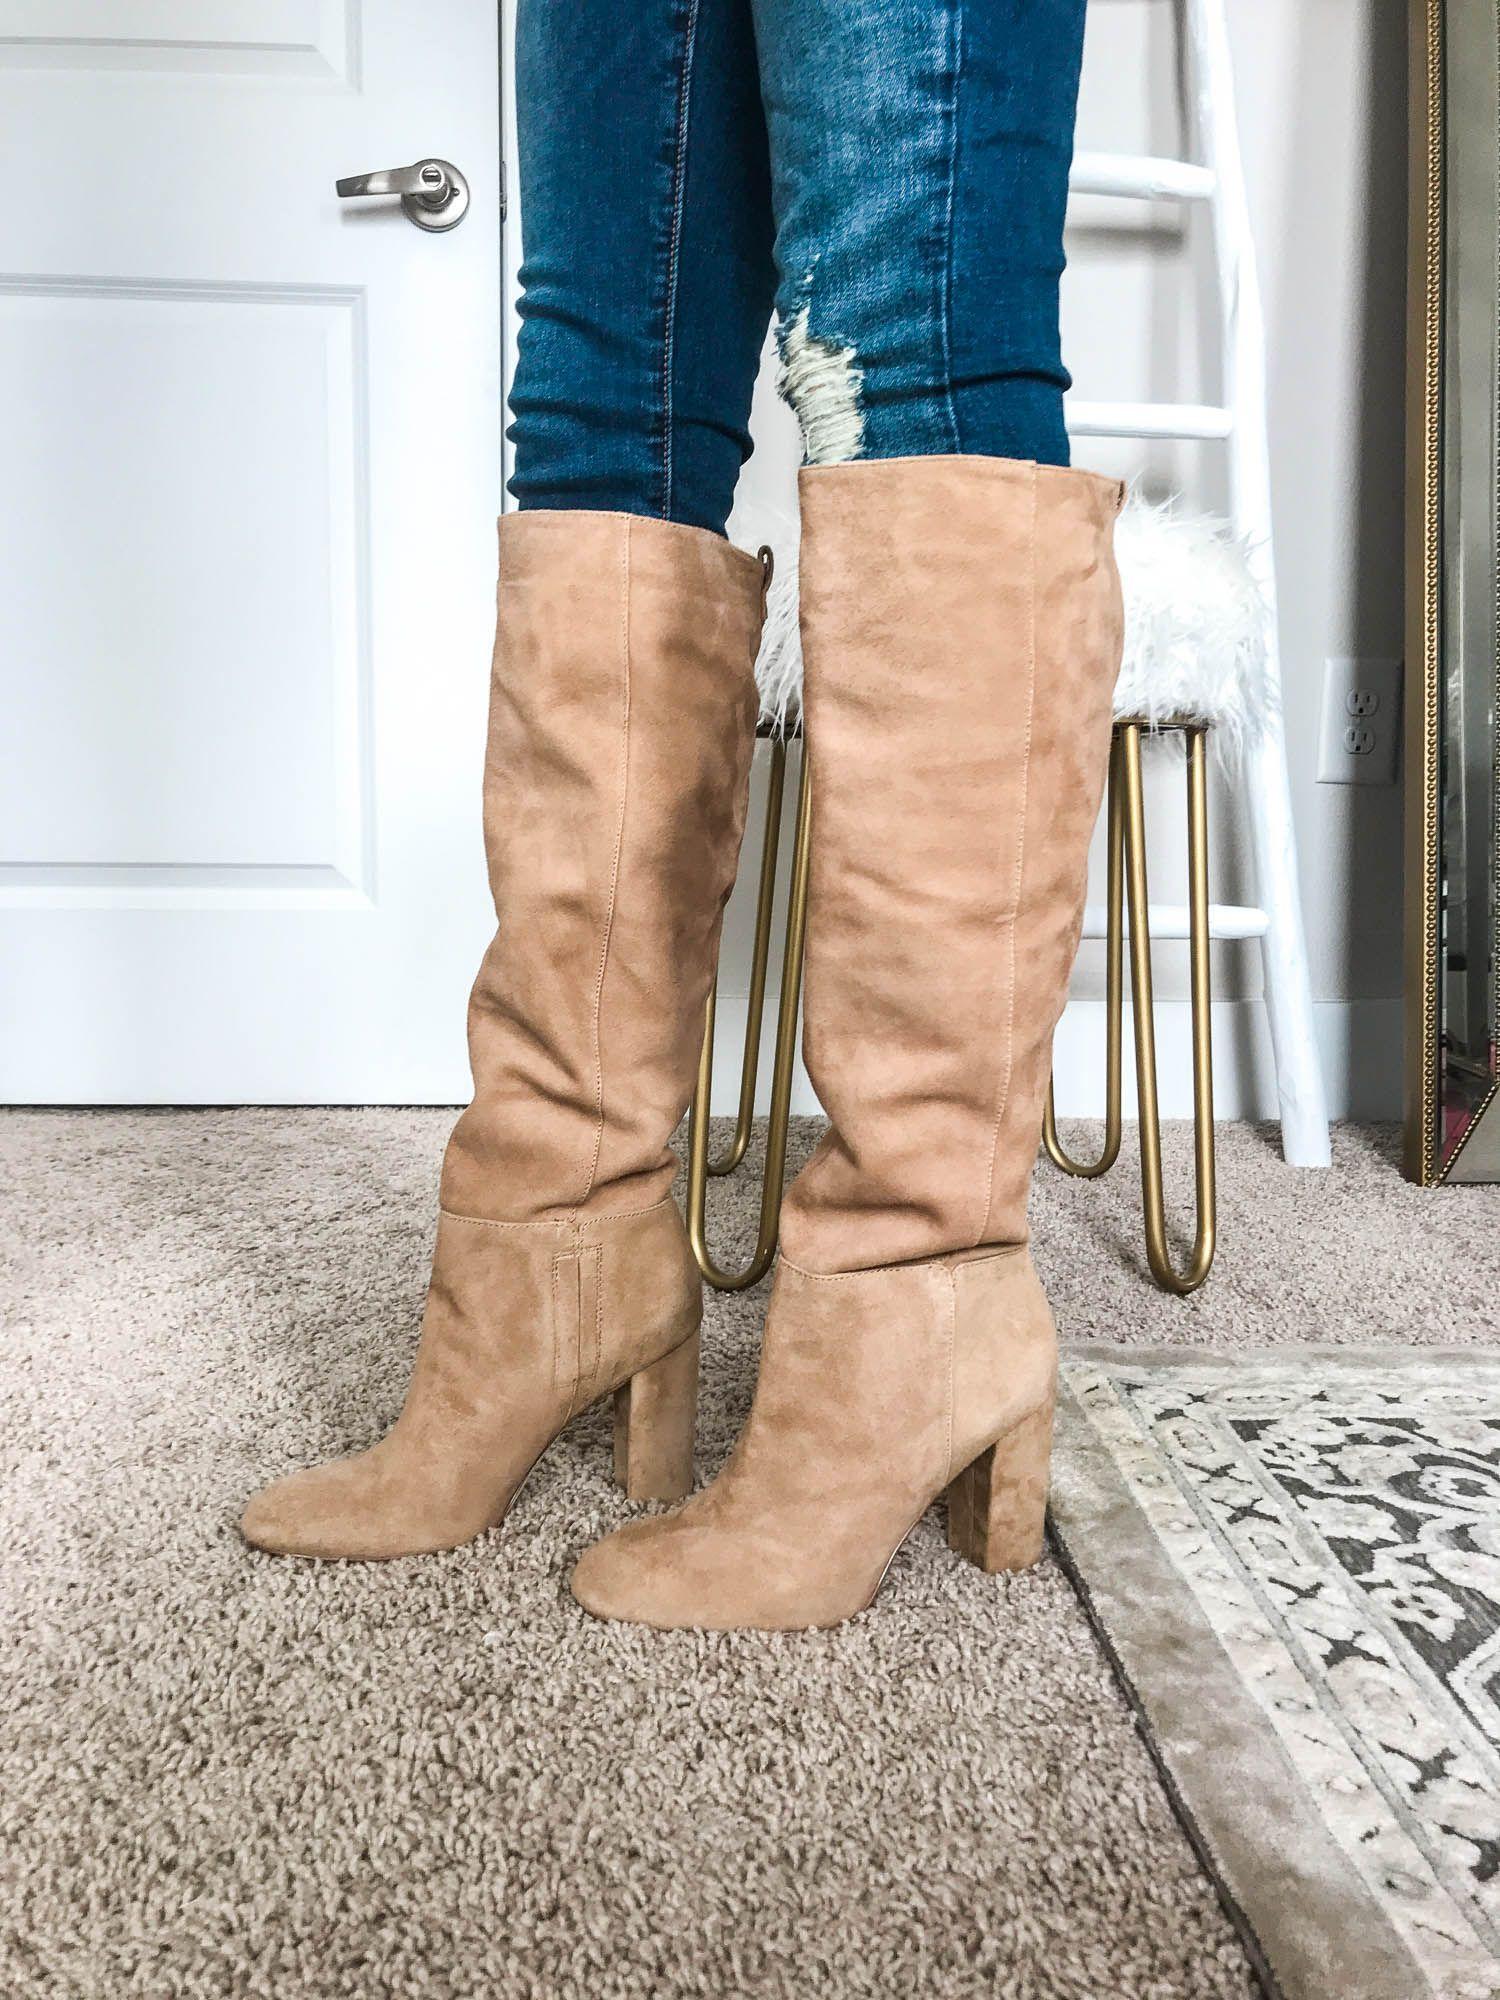 782afe548e9 Sam Edelman boots in the Nordstrom Sale - Best shoe picks